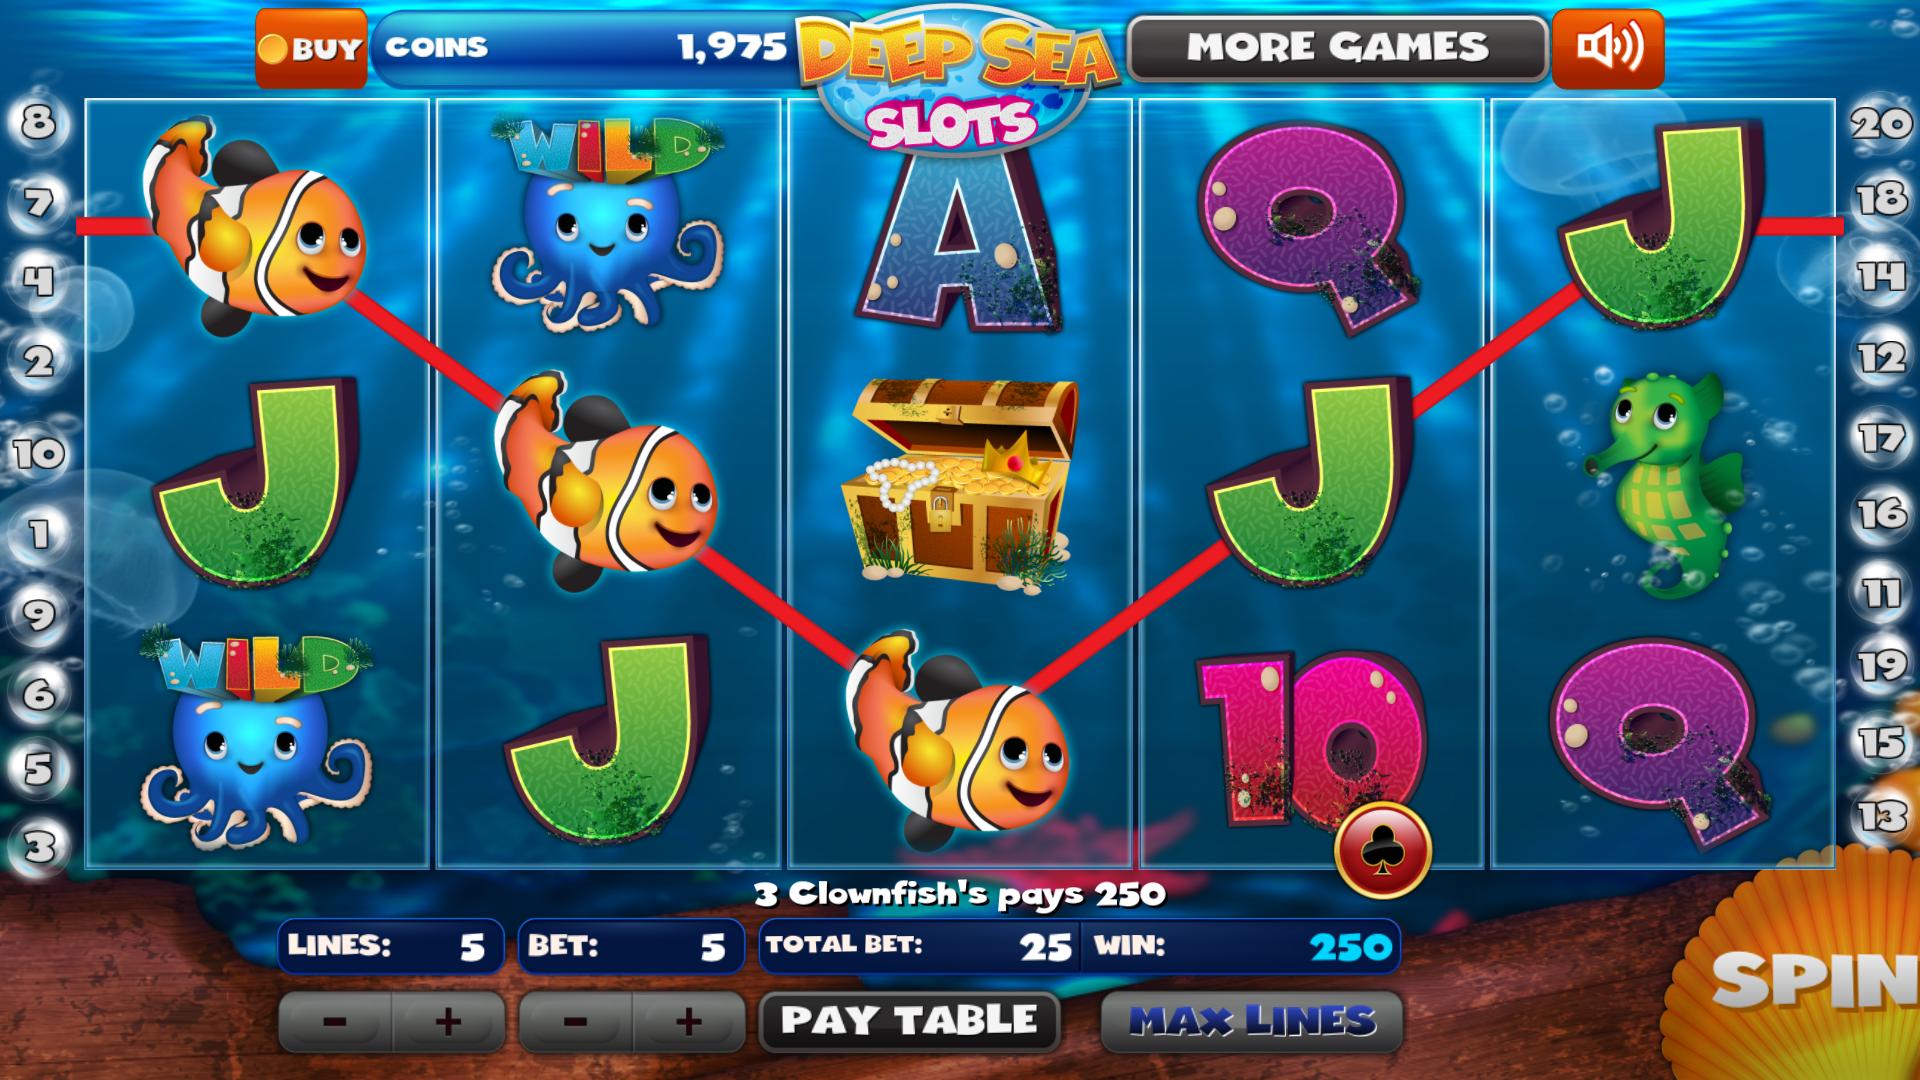 Deep Blue Slot - Play Free Casino Slot Machine Games